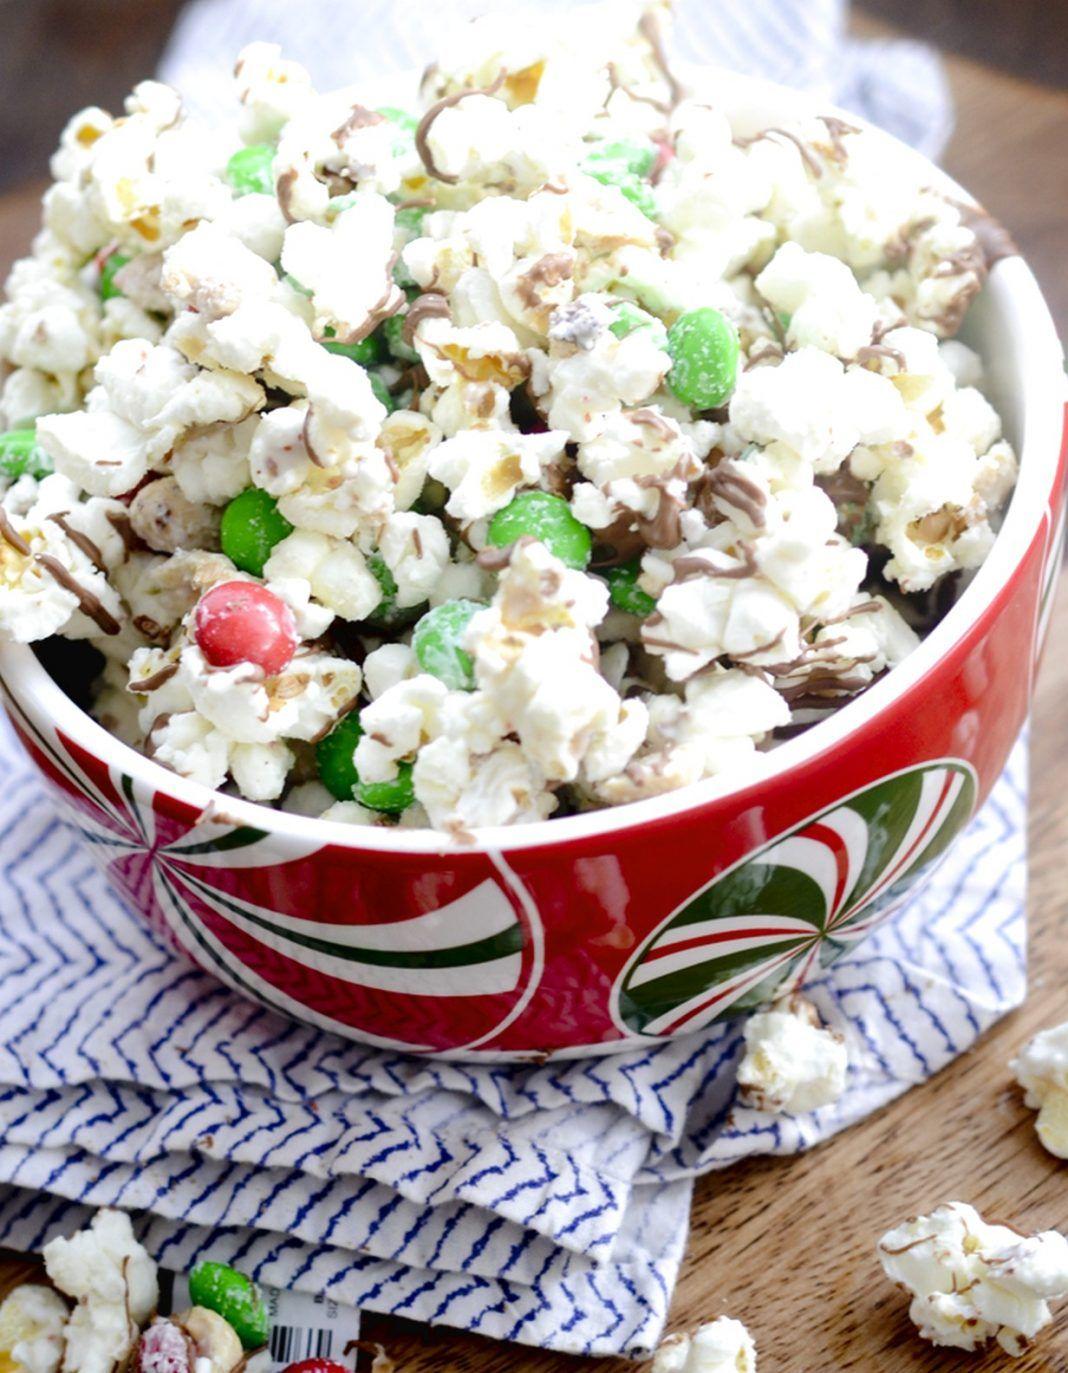 Christmas Popcorn Christmas popcorn, Christmas bark